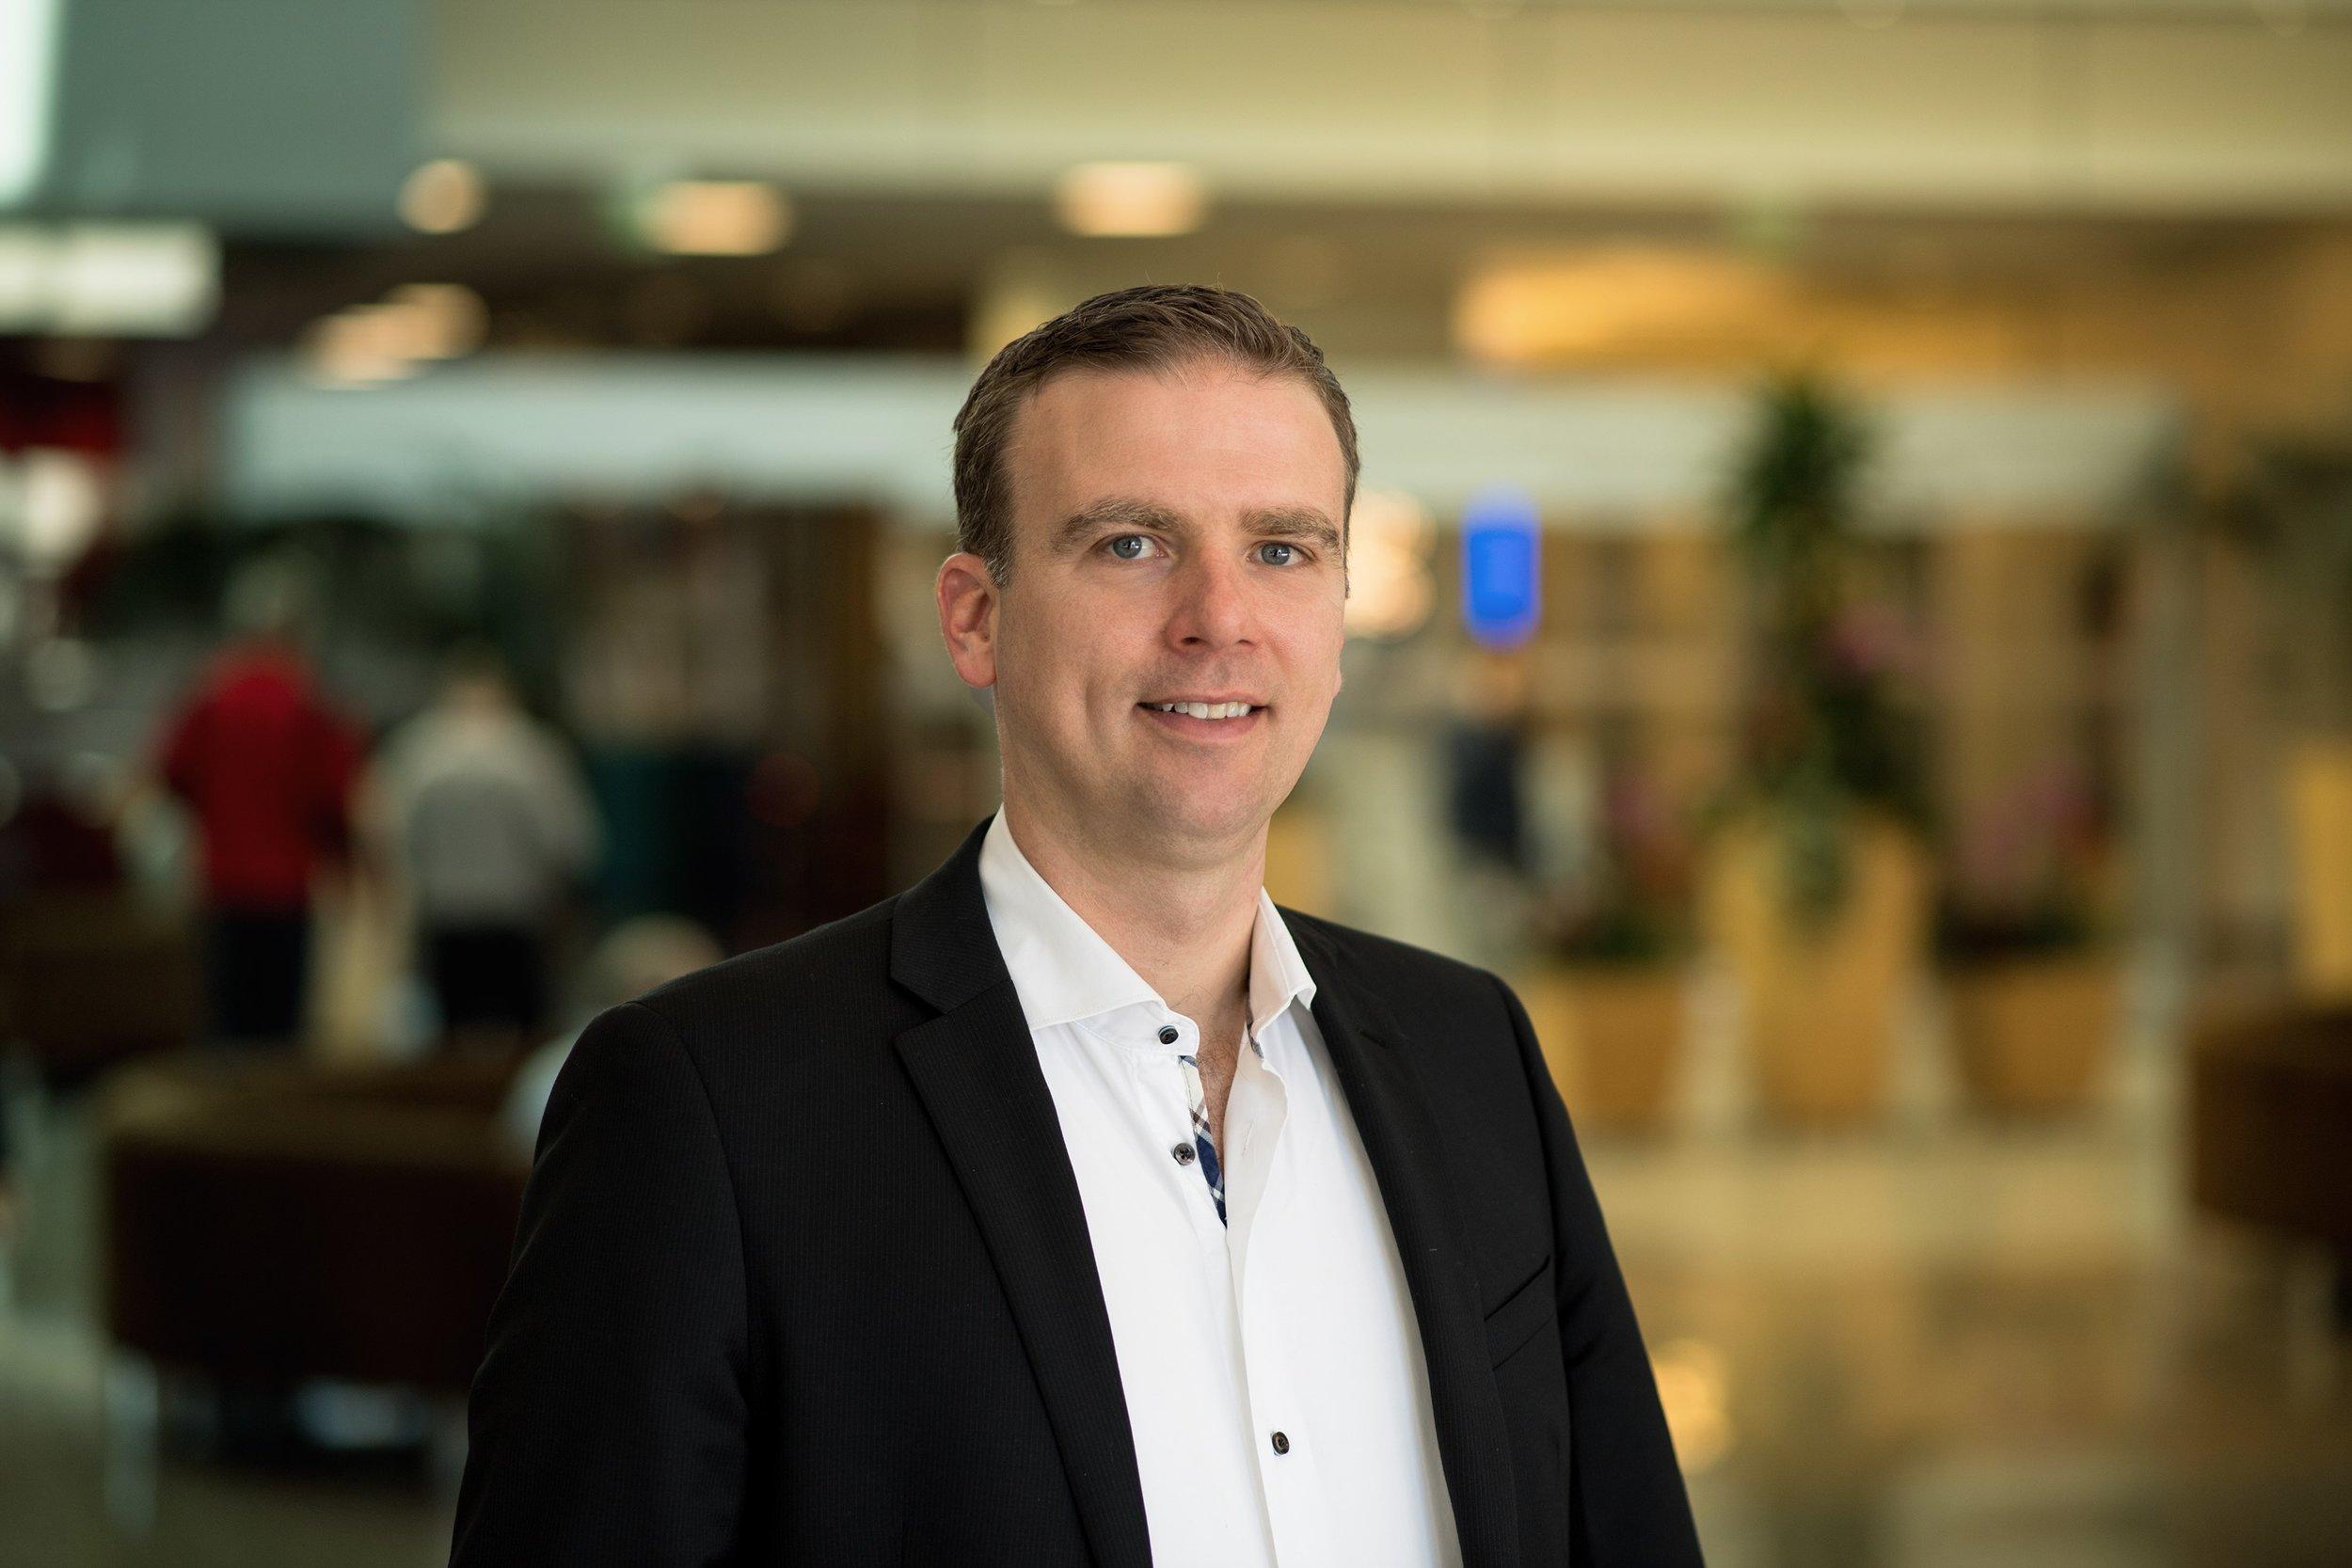 Hugo Swart,Senior Director, Product Management, Qualcomm Atheros, Inc.